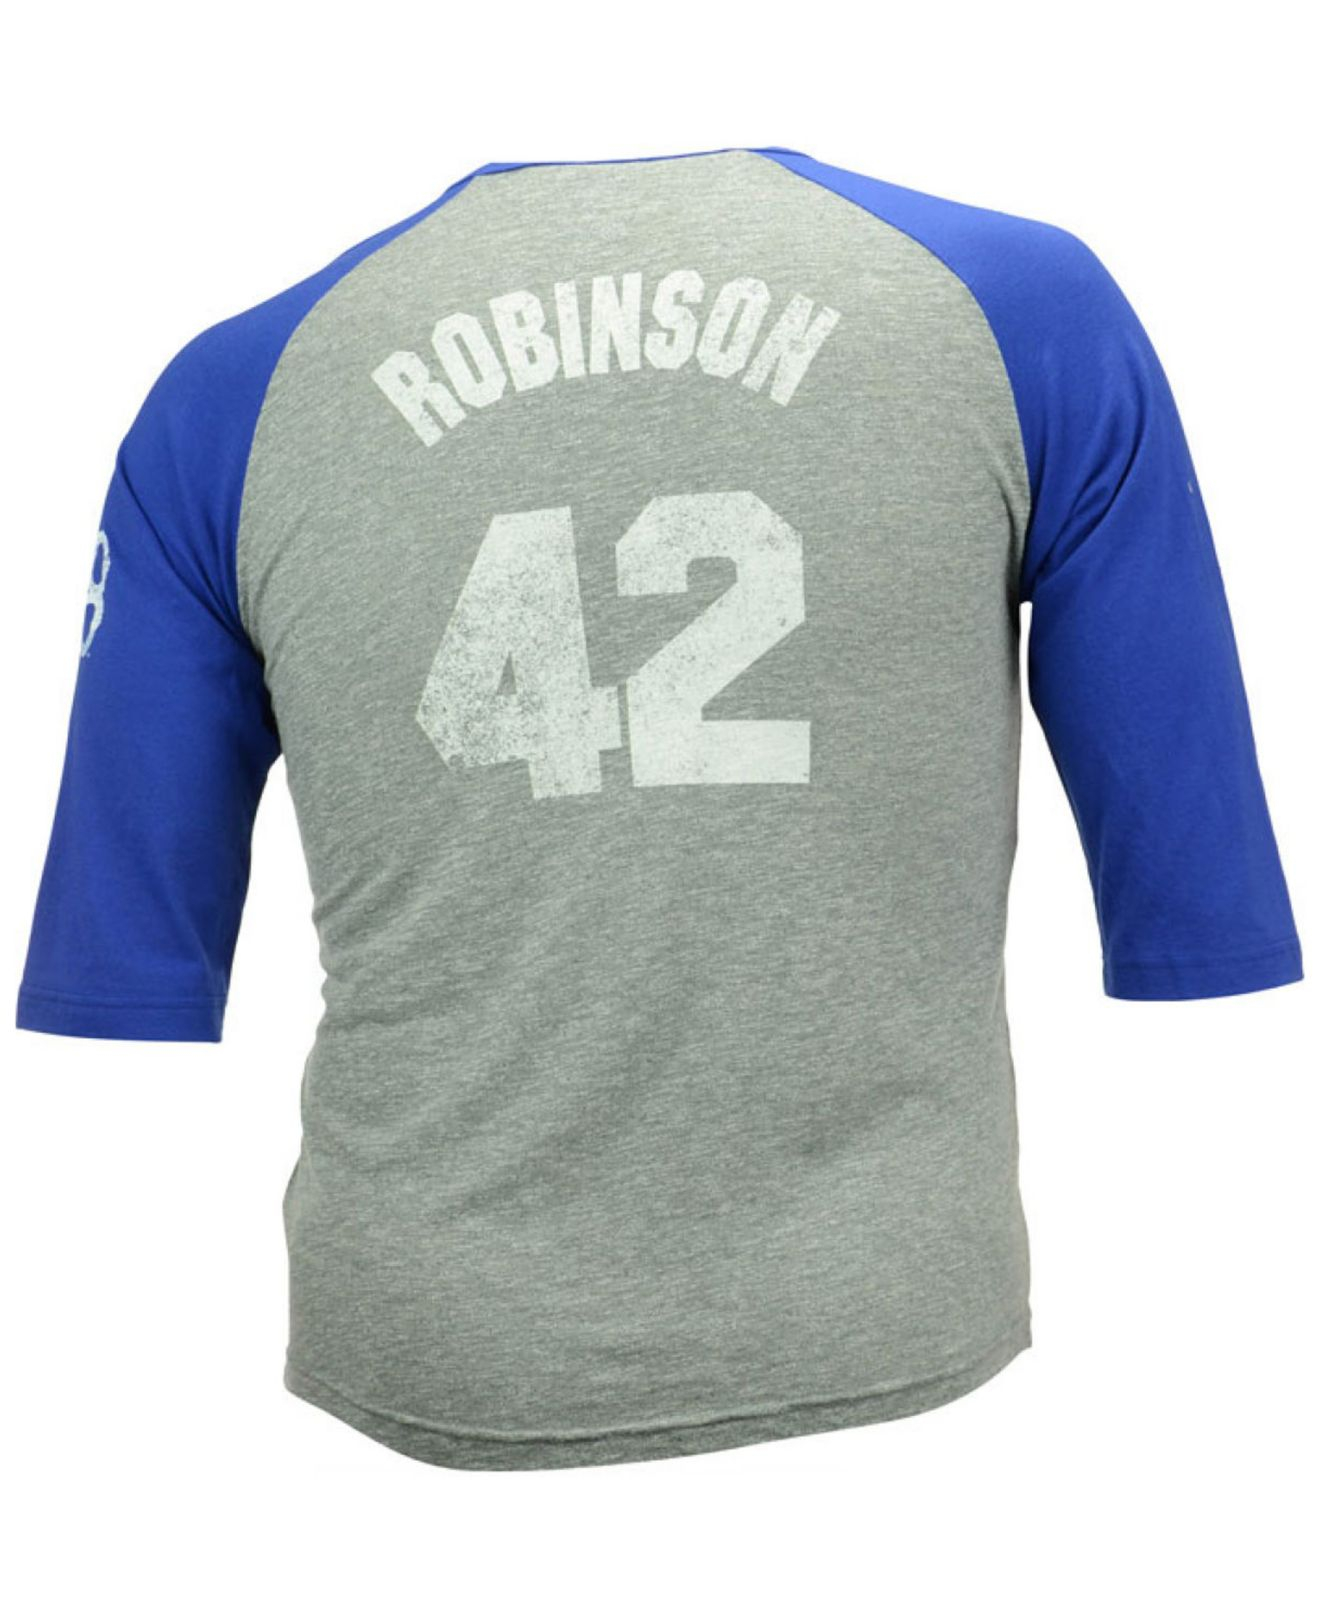 36c6ffbd2 Lyst - Majestic Men'S Jackie Robinson Brooklyn Dodgers Cooperstown ...